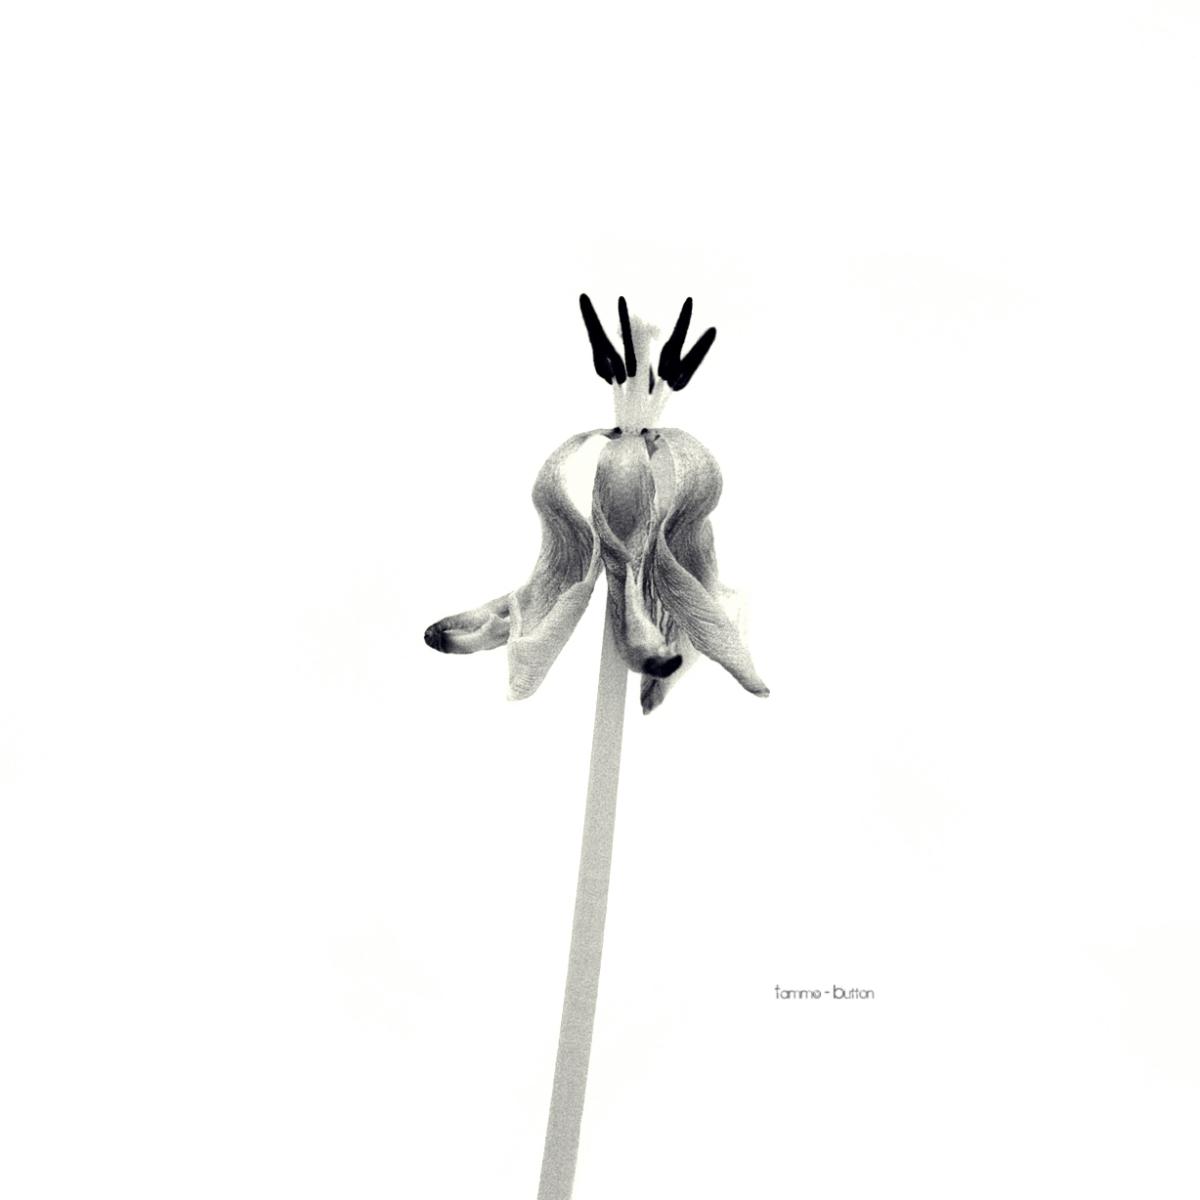 Withered tulip - verwelkte Tulpe